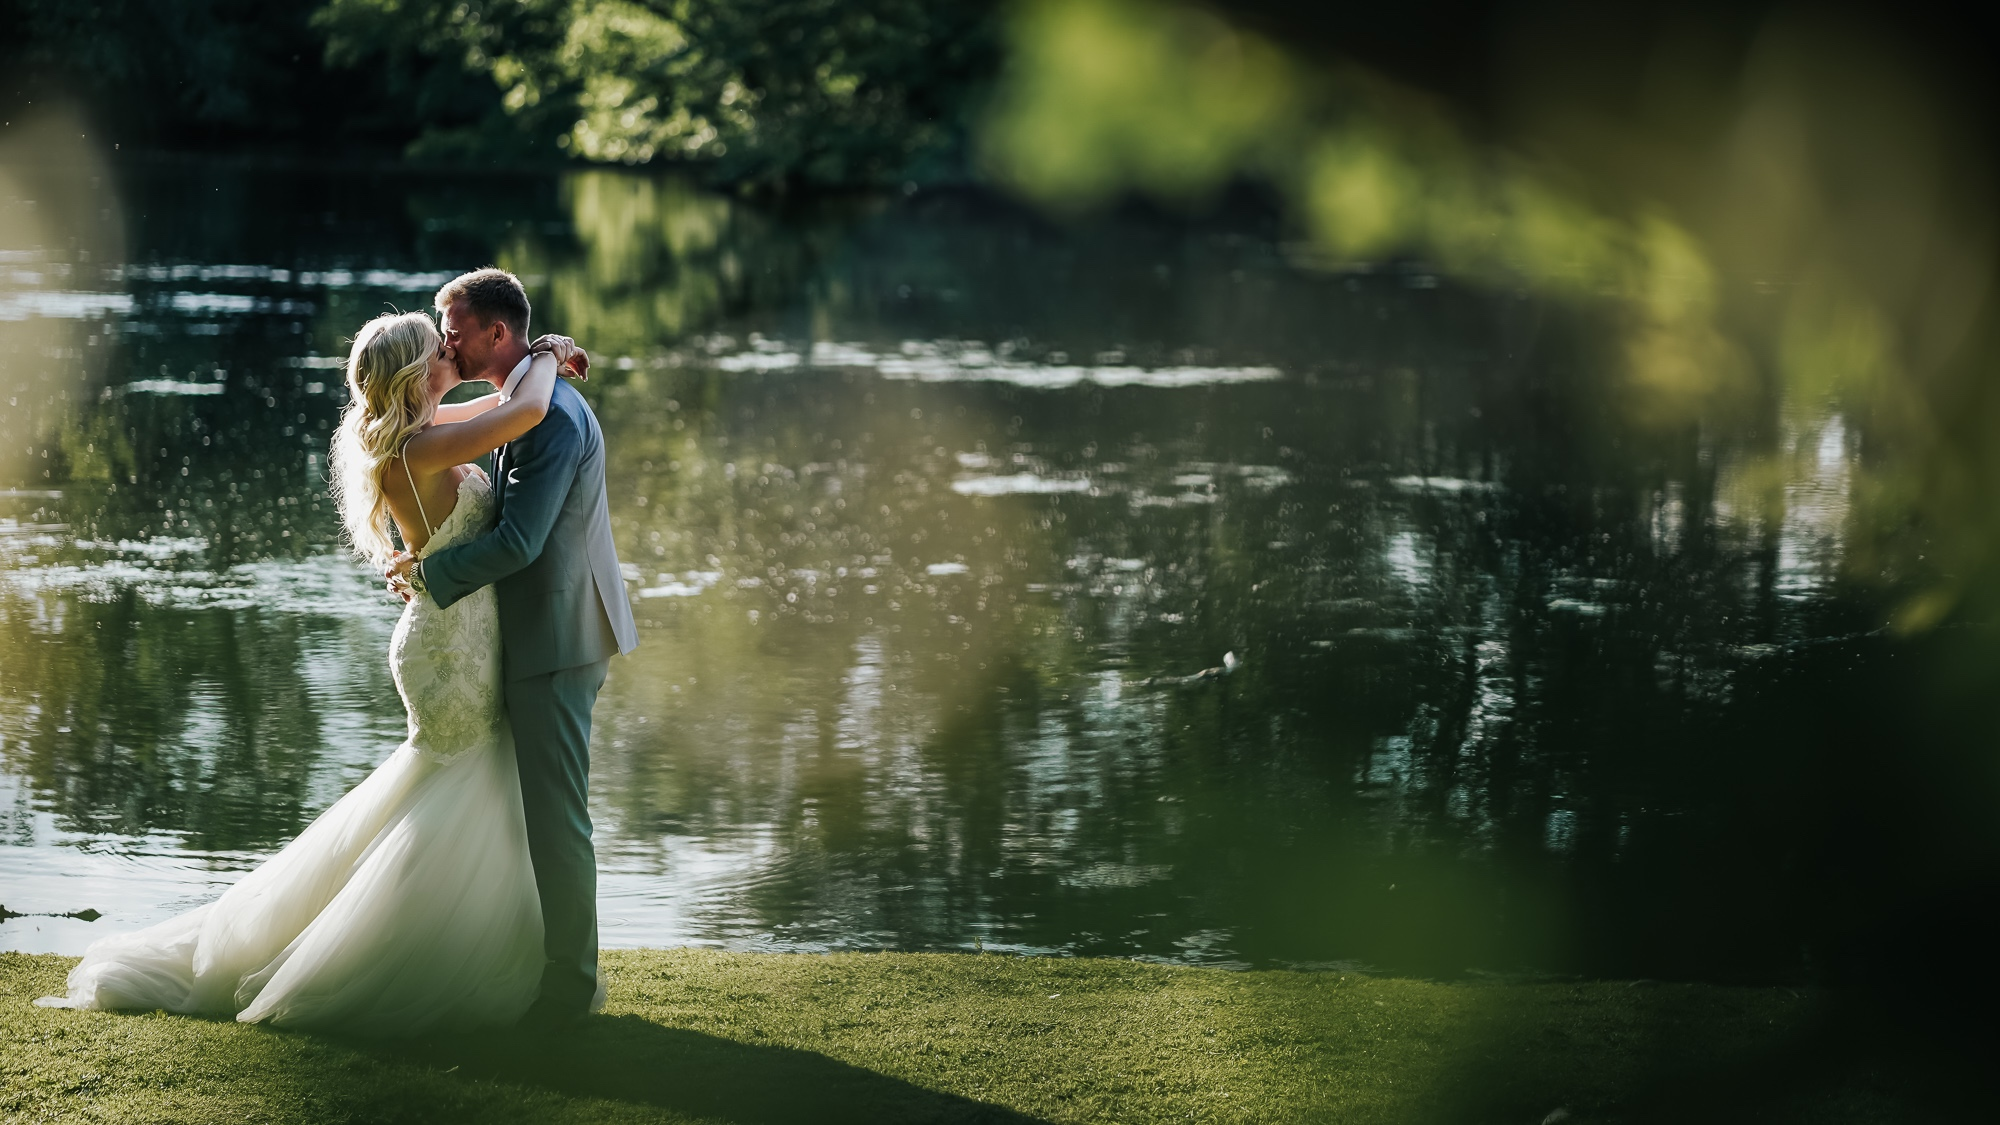 Thornton+Manor+Lakeside+Marquee+Wedding+Photographer++%2846+of+53%29.jpg